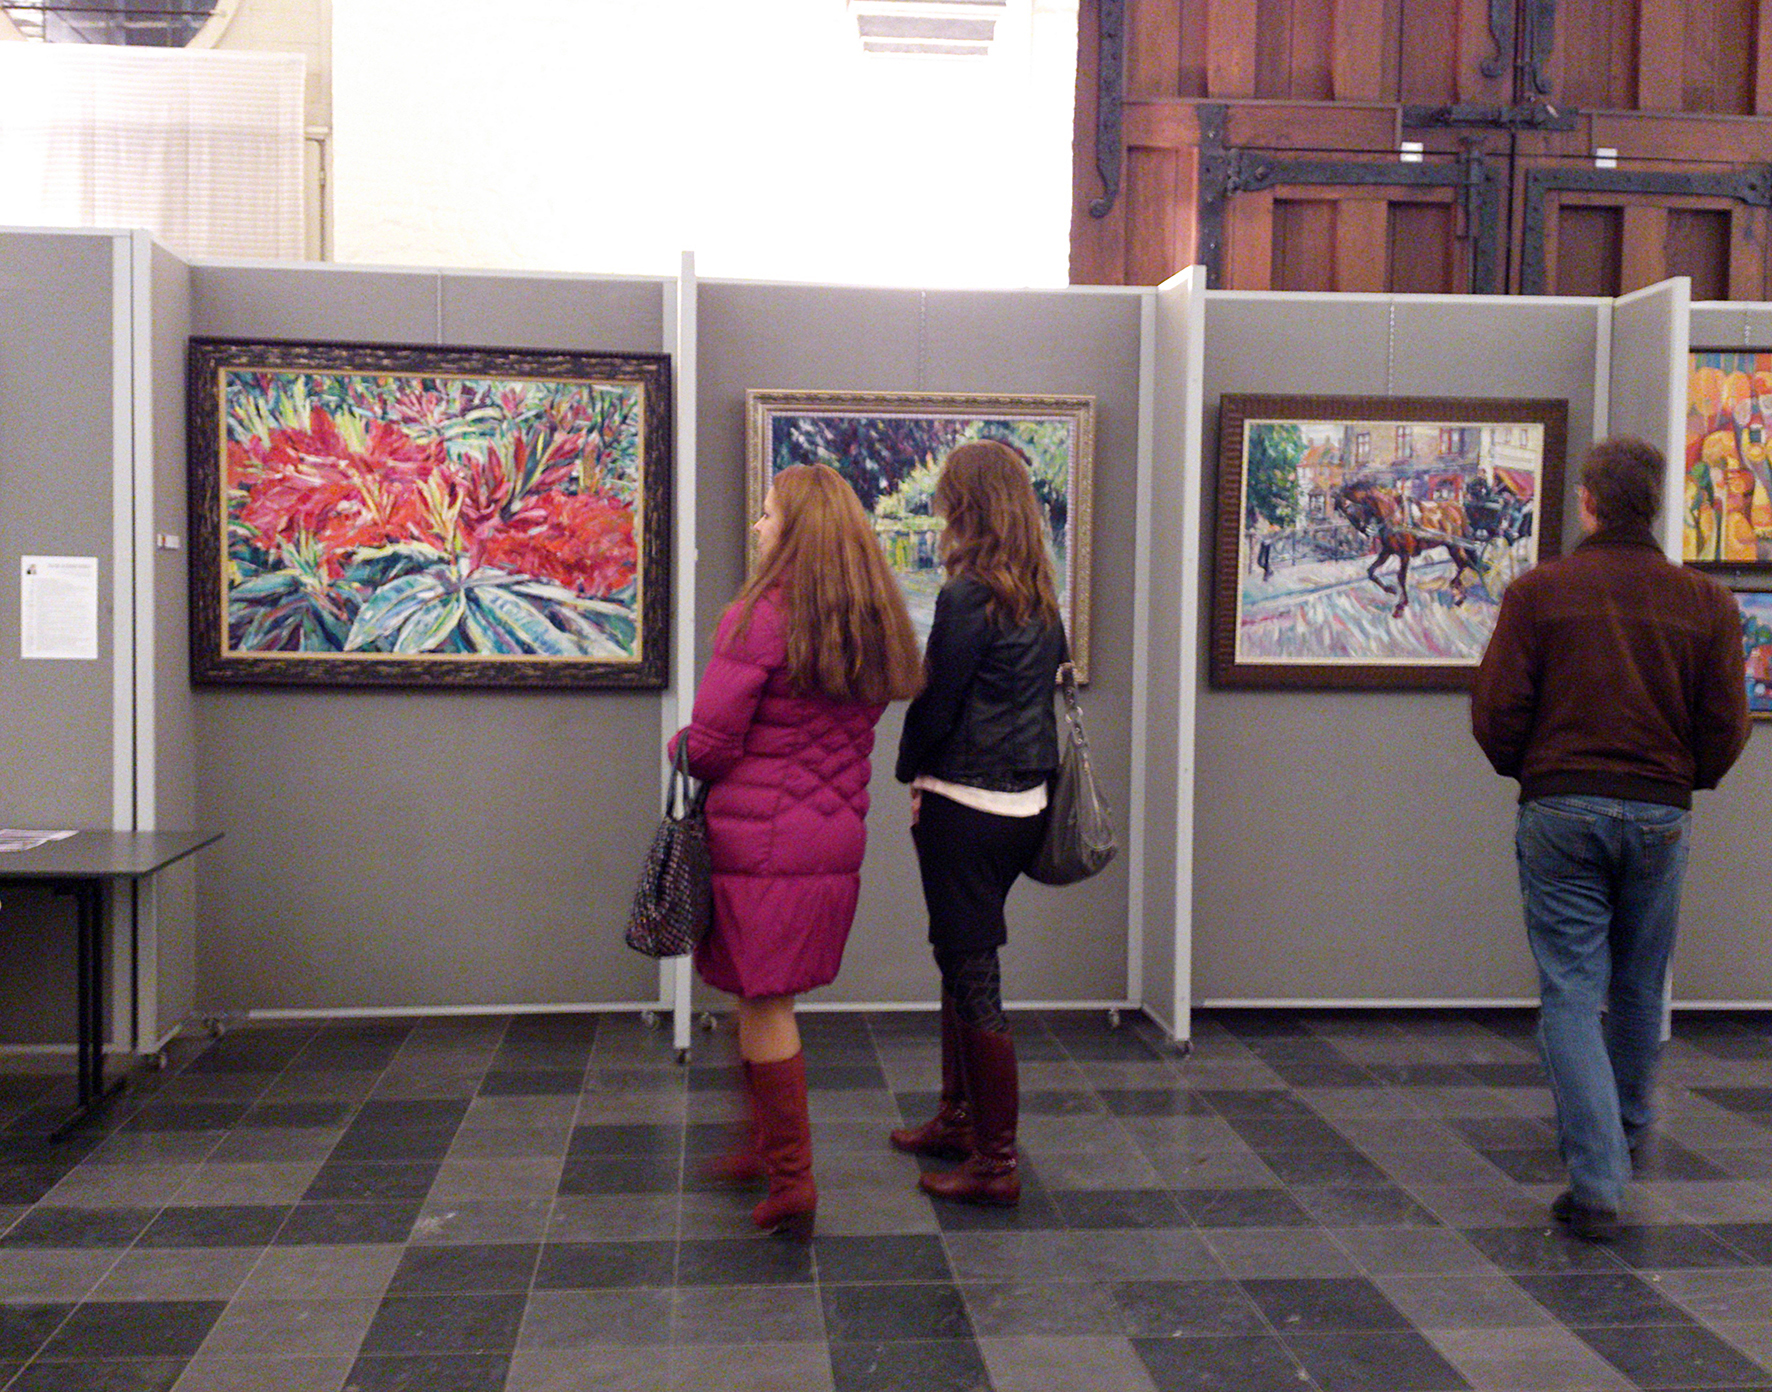 International Art Festival Art Coctail Brugge, Jan Garemijnzaal. Belgium, 13-23.11.2013